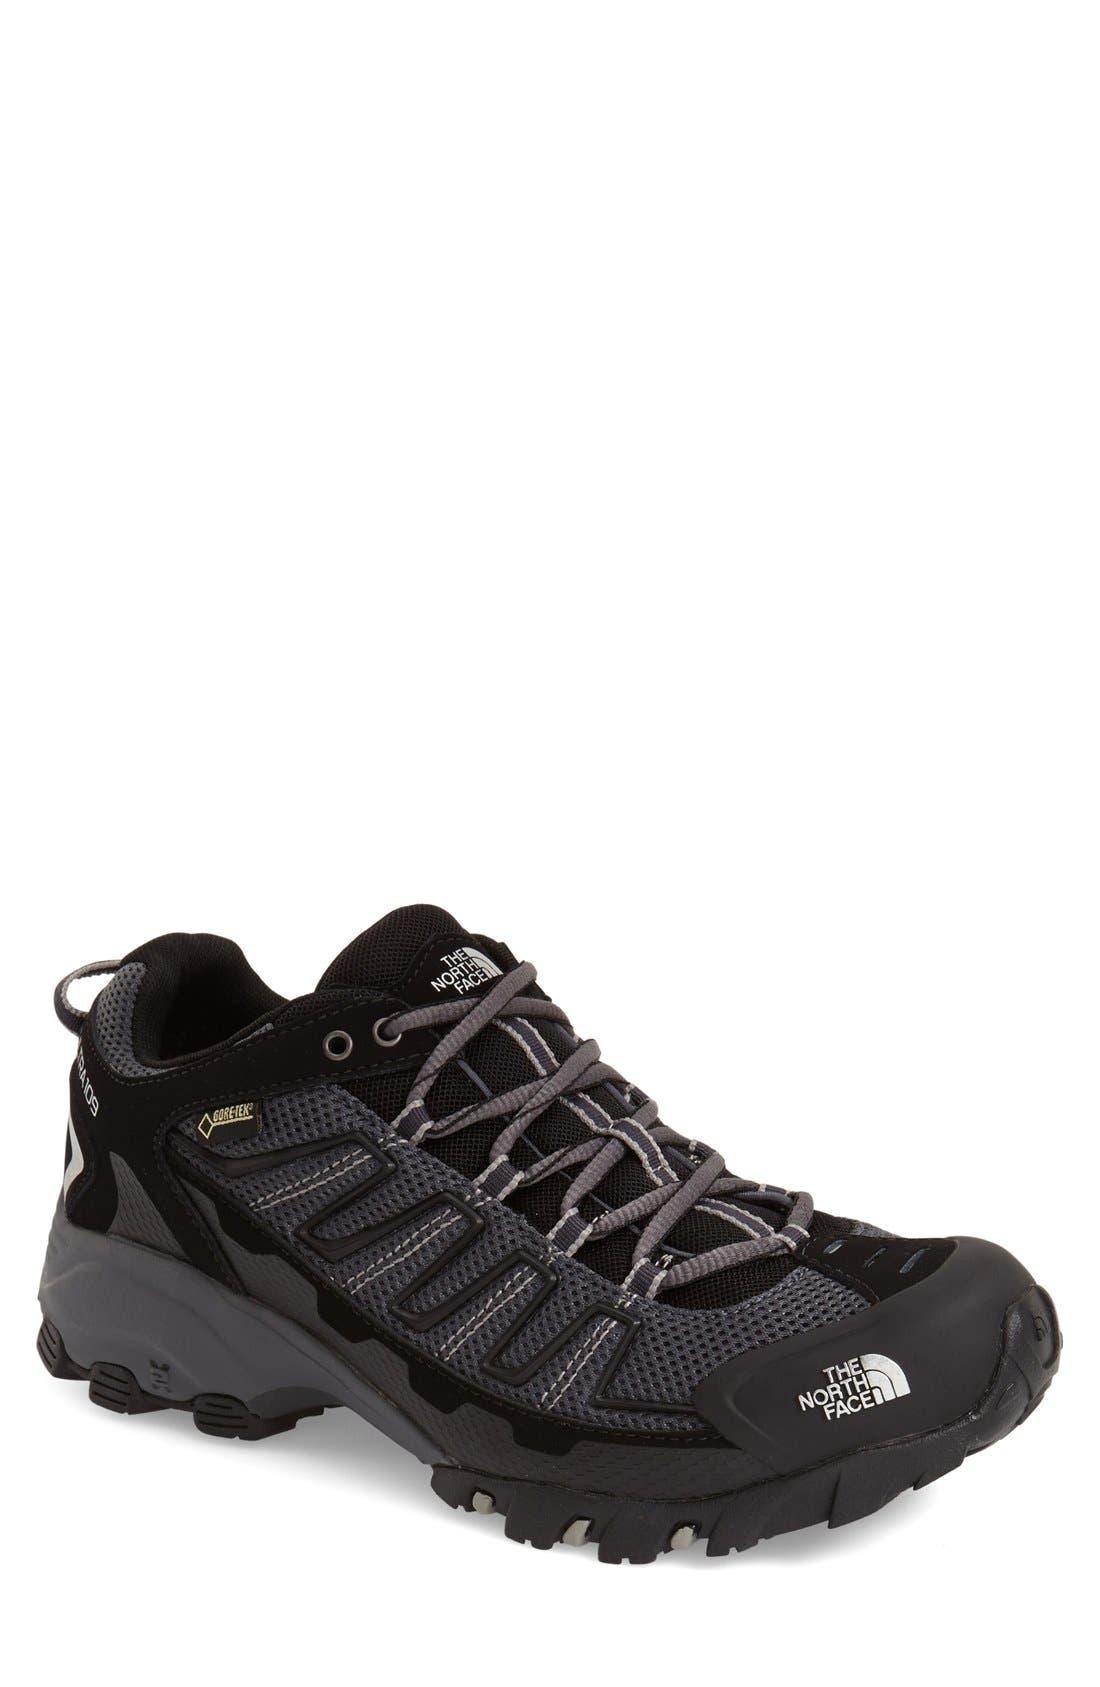 'Ultra 109 GTX' Waterproof Running Shoe,                         Main,                         color, Black/ Dark Shadow Grey